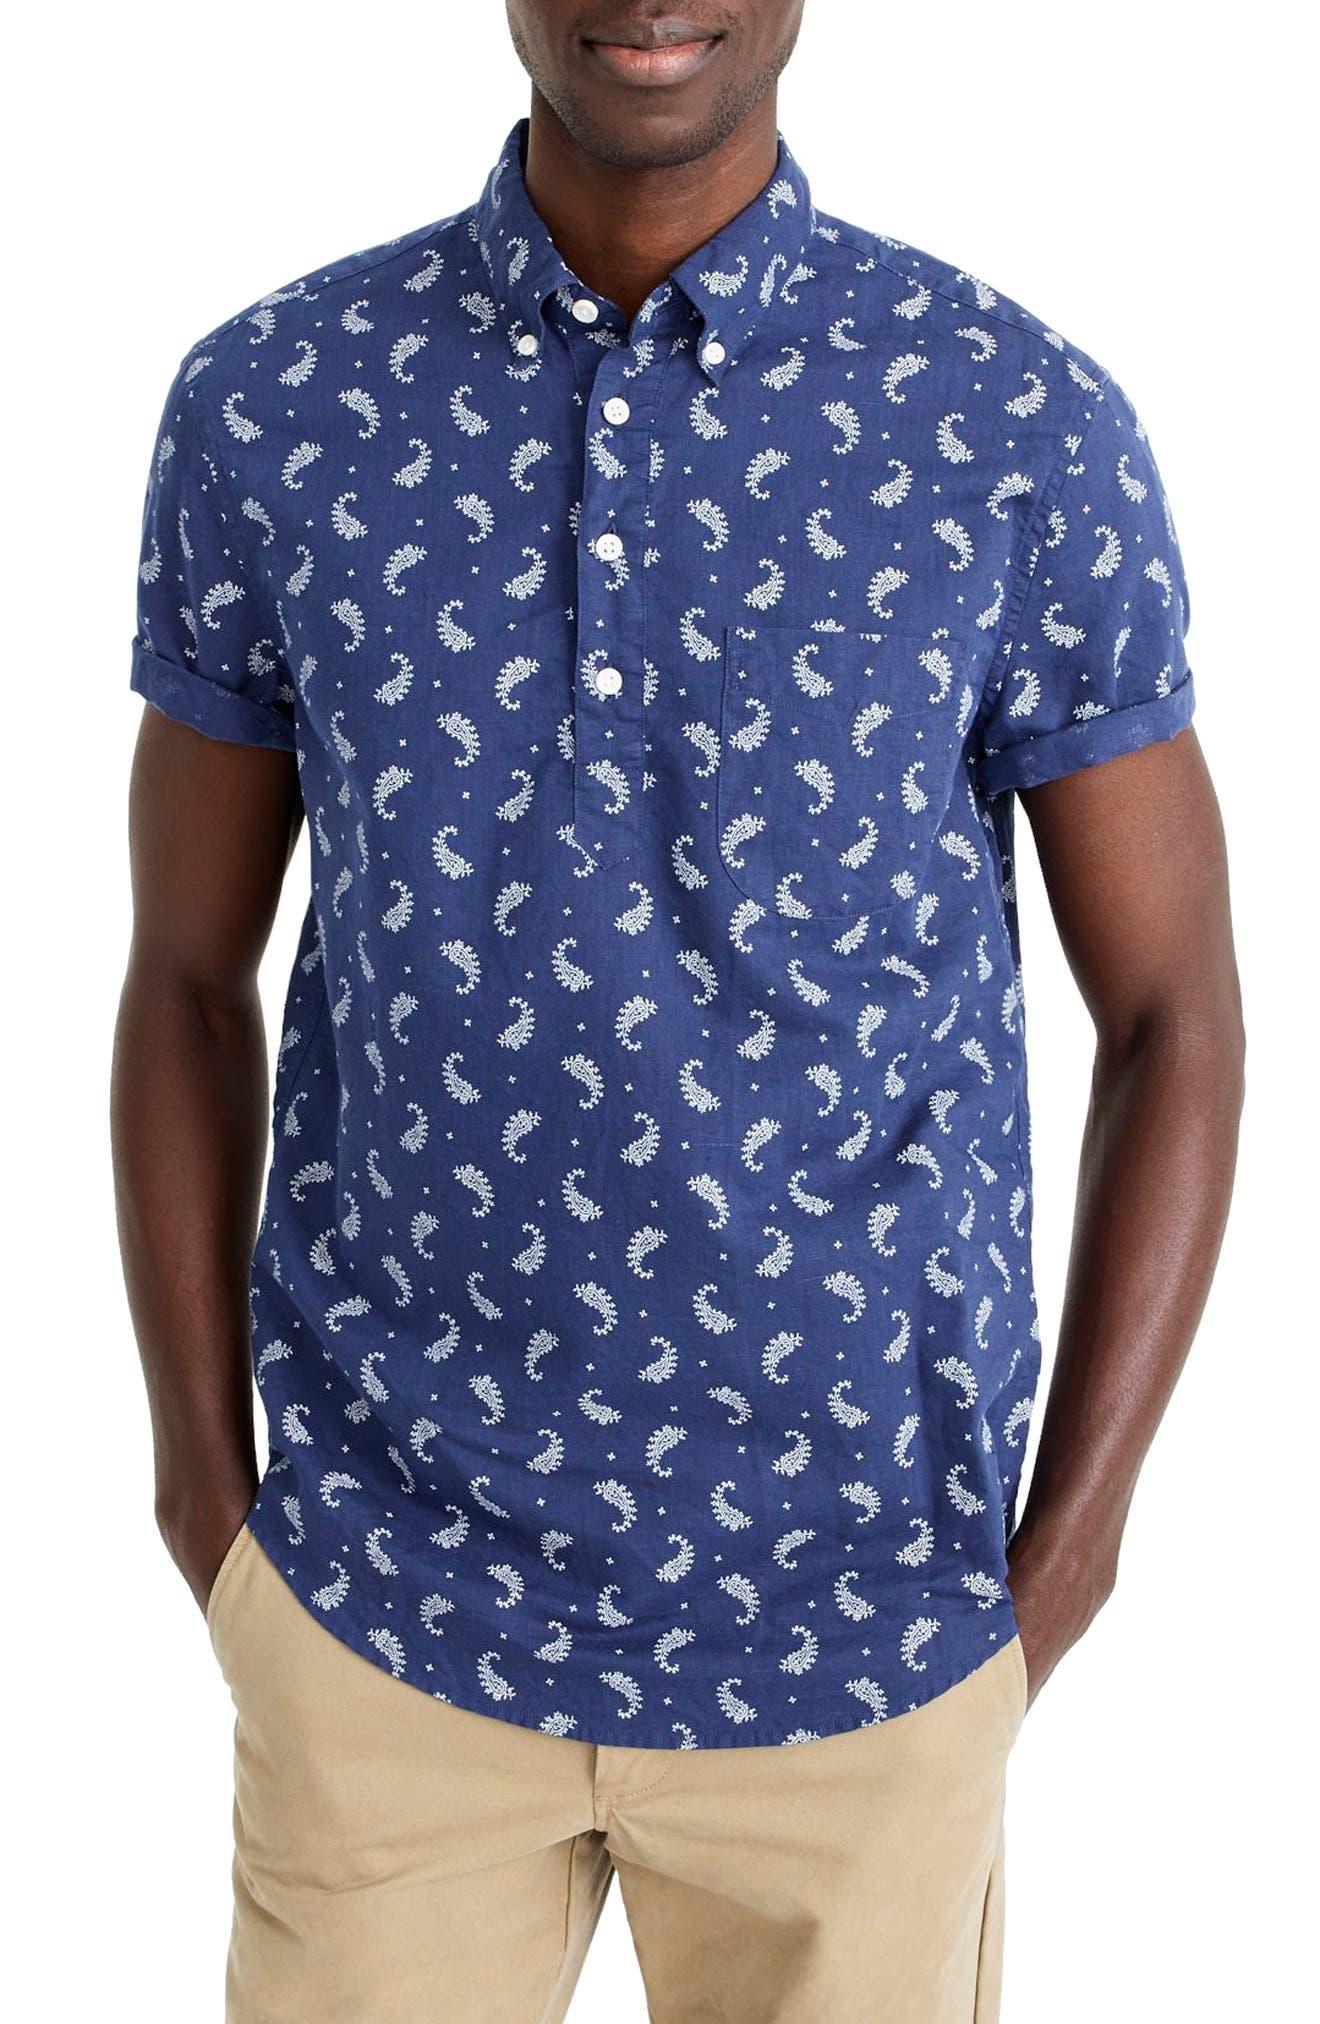 Alternate Image 1 Selected - J.Crew Short Sleeve Paisley Linen & Cotton Popover Shirt